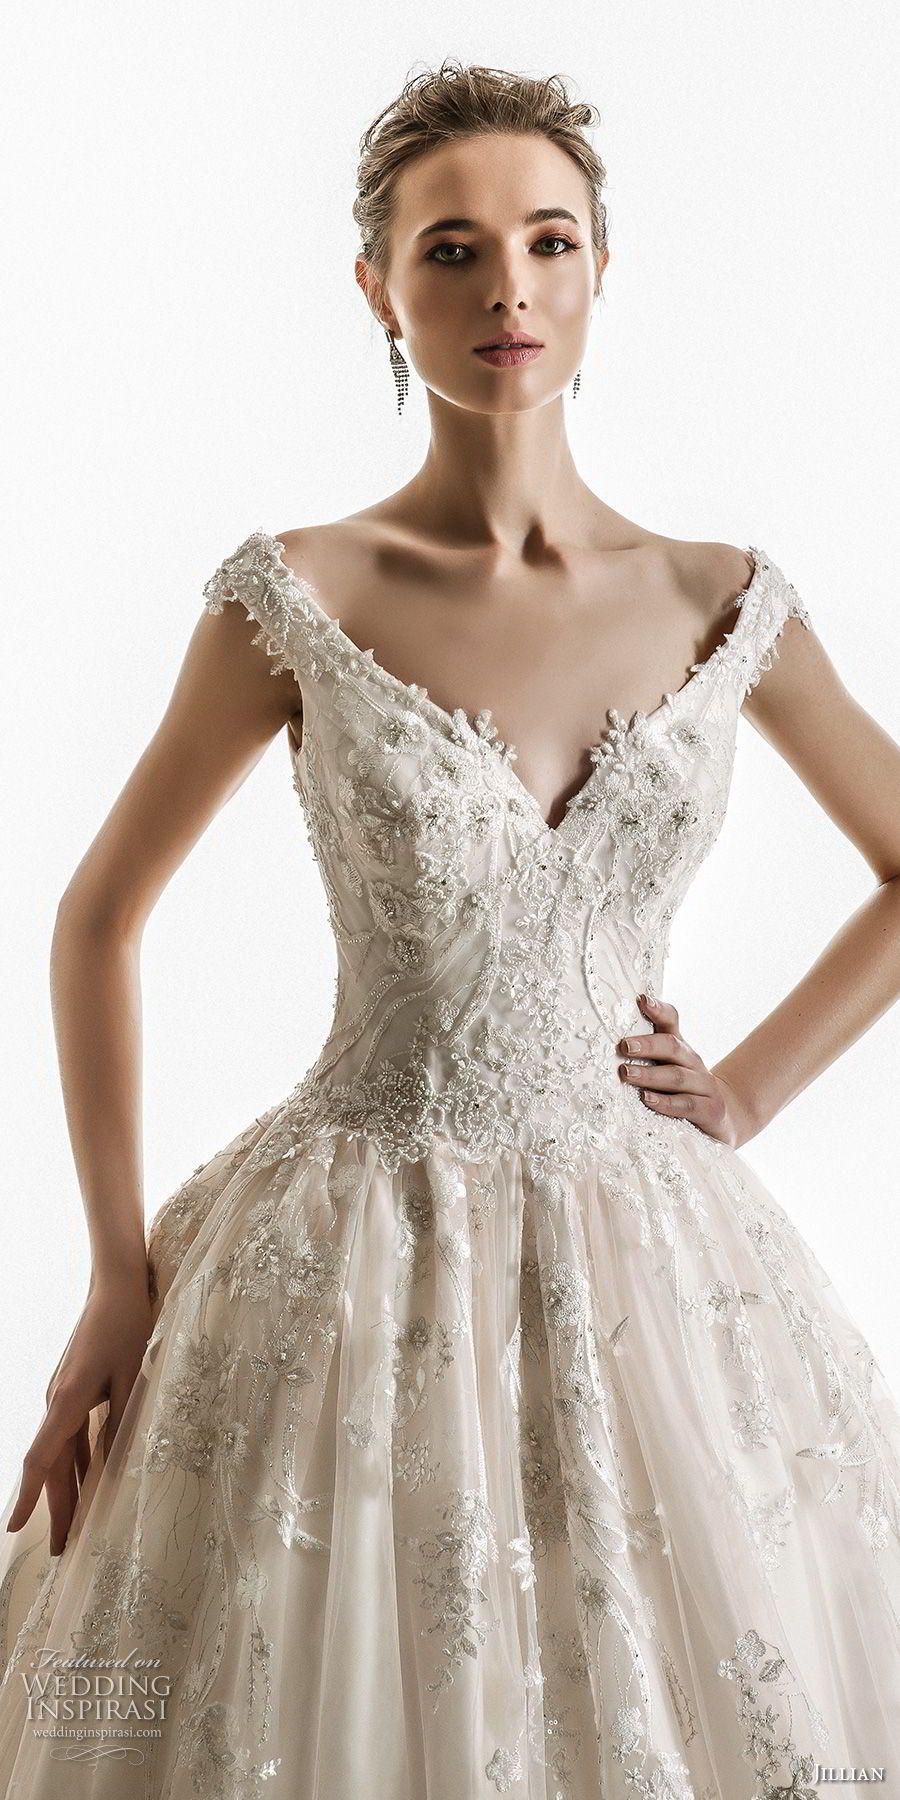 Jillian wedding dresses chapel train ball gowns and bodice